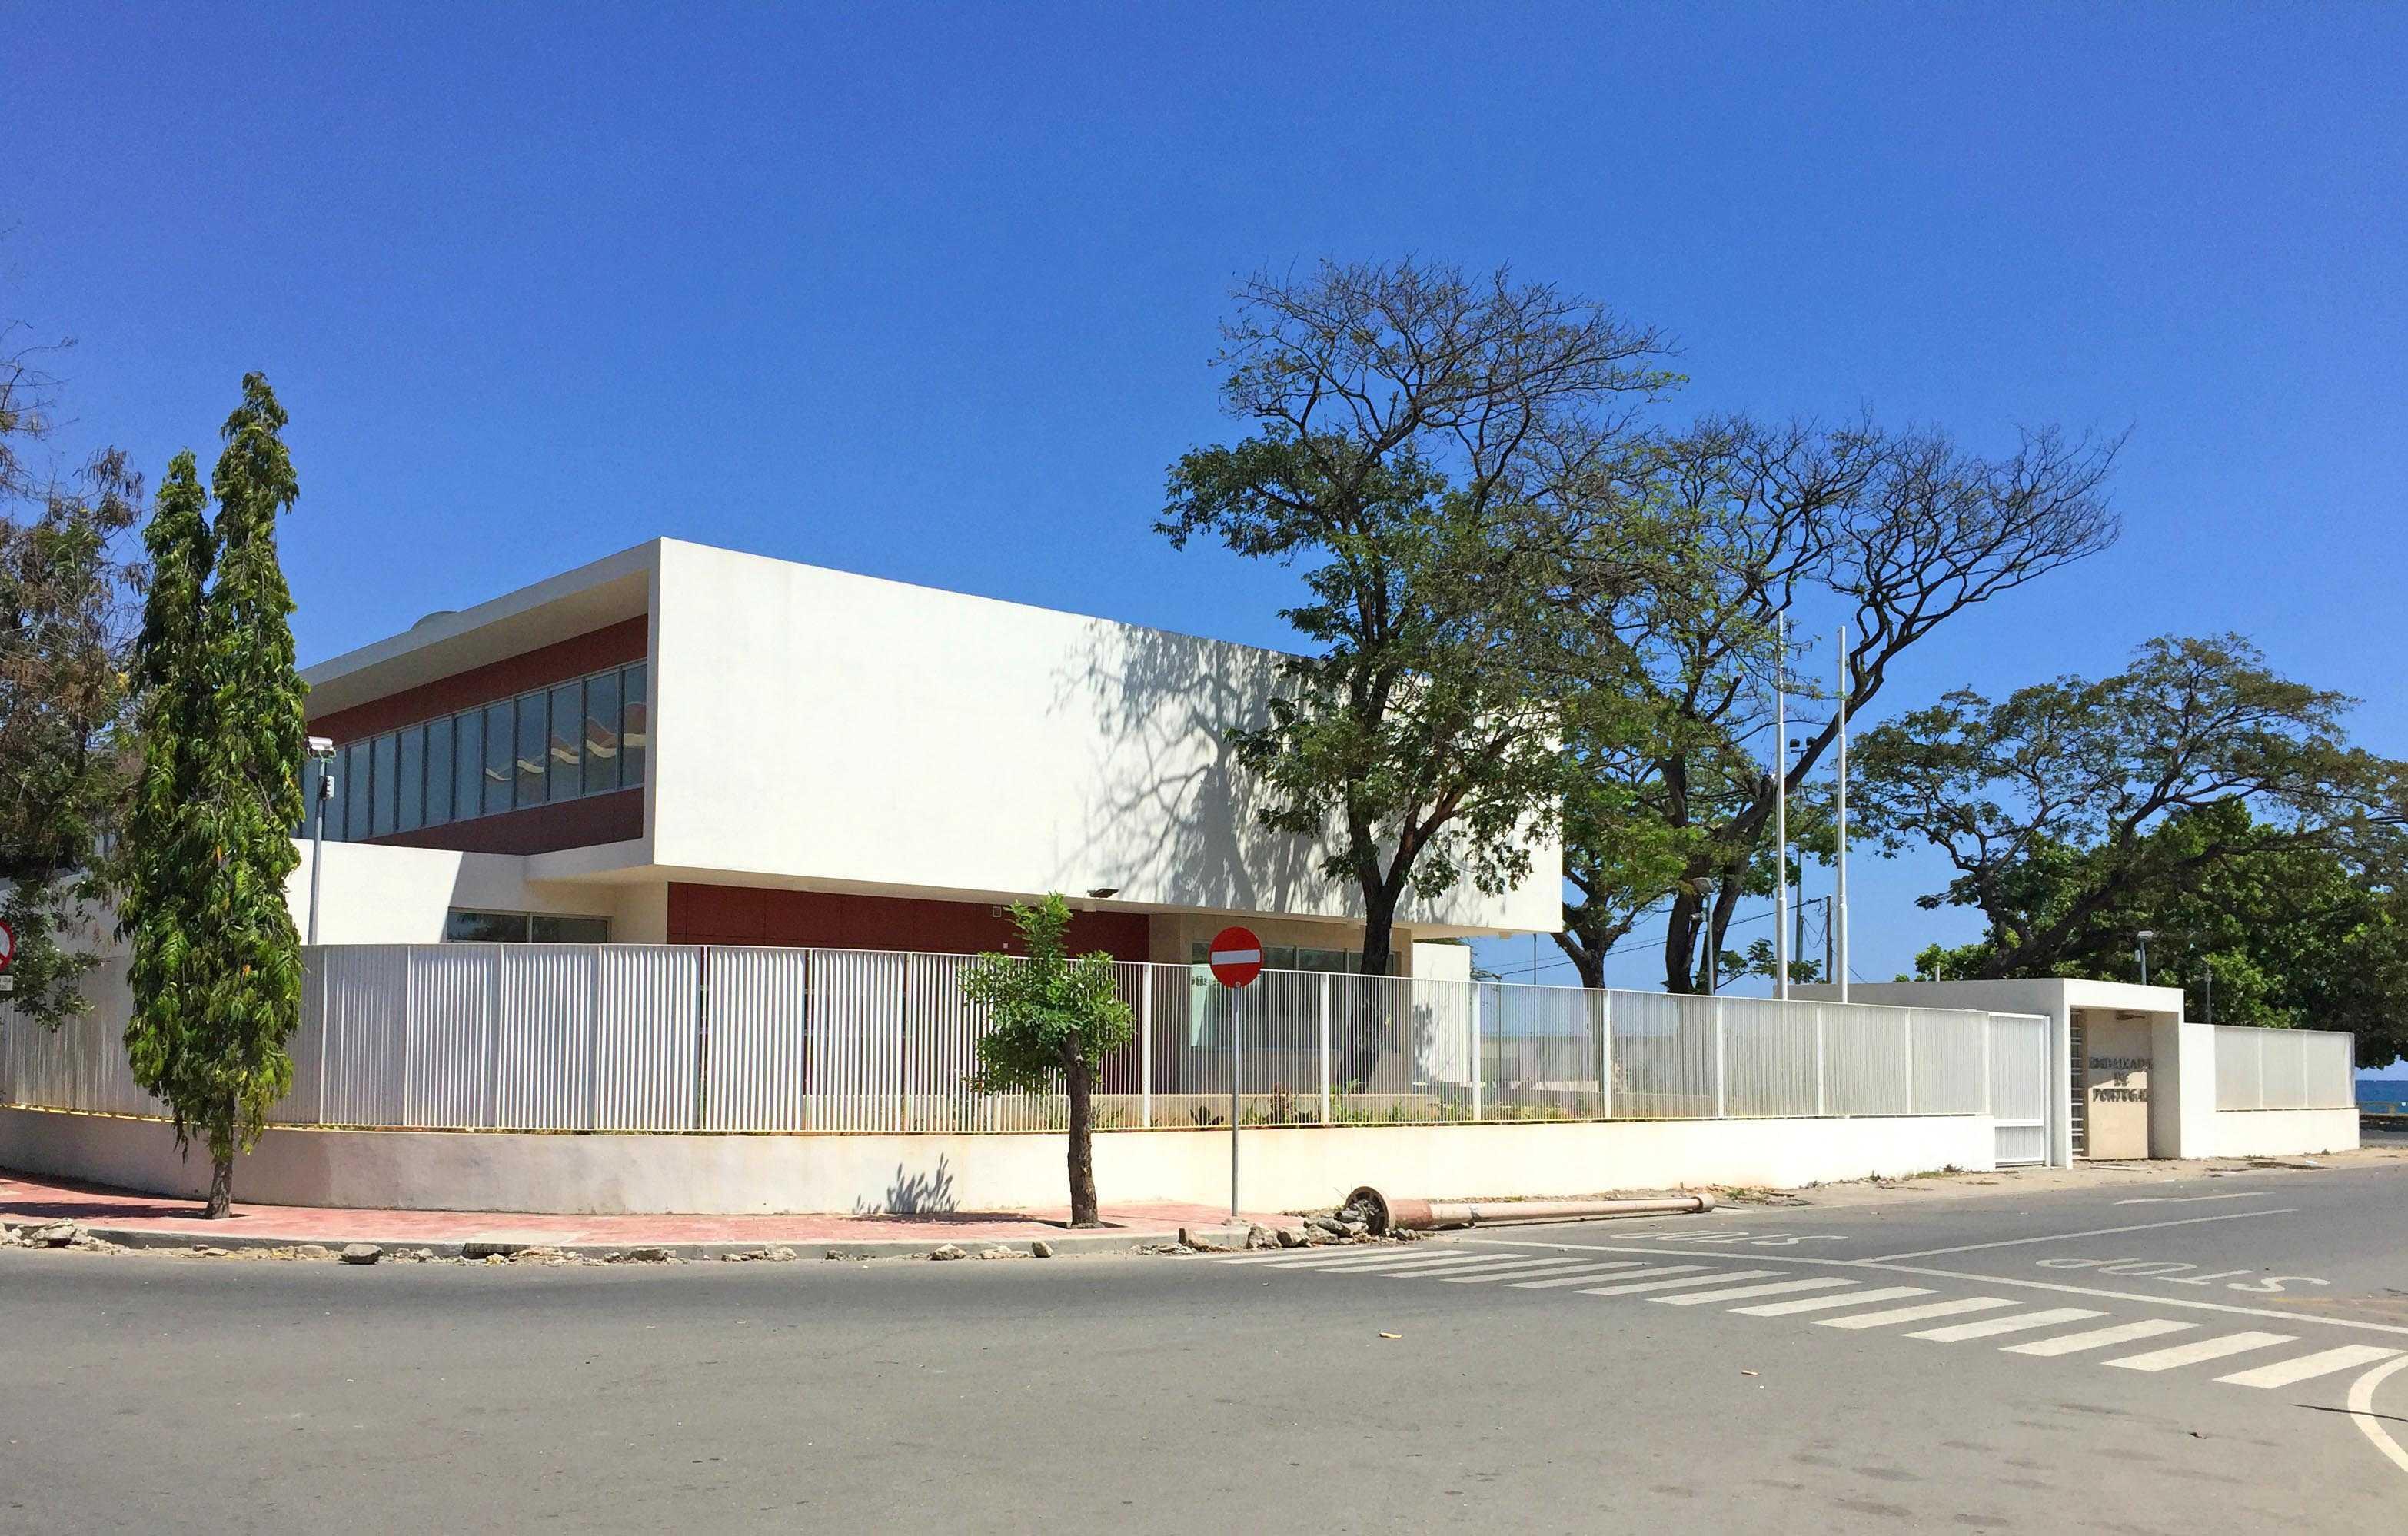 Nla Timor Urban Planning Architecture & Engineering Portugal Embassy Dili, Timor Leste Timor-Leste  Nla-Timor-Urban-Planning-Architecture-Engineering-Portugal-Embassy-Dili-Timor-Leste   50350